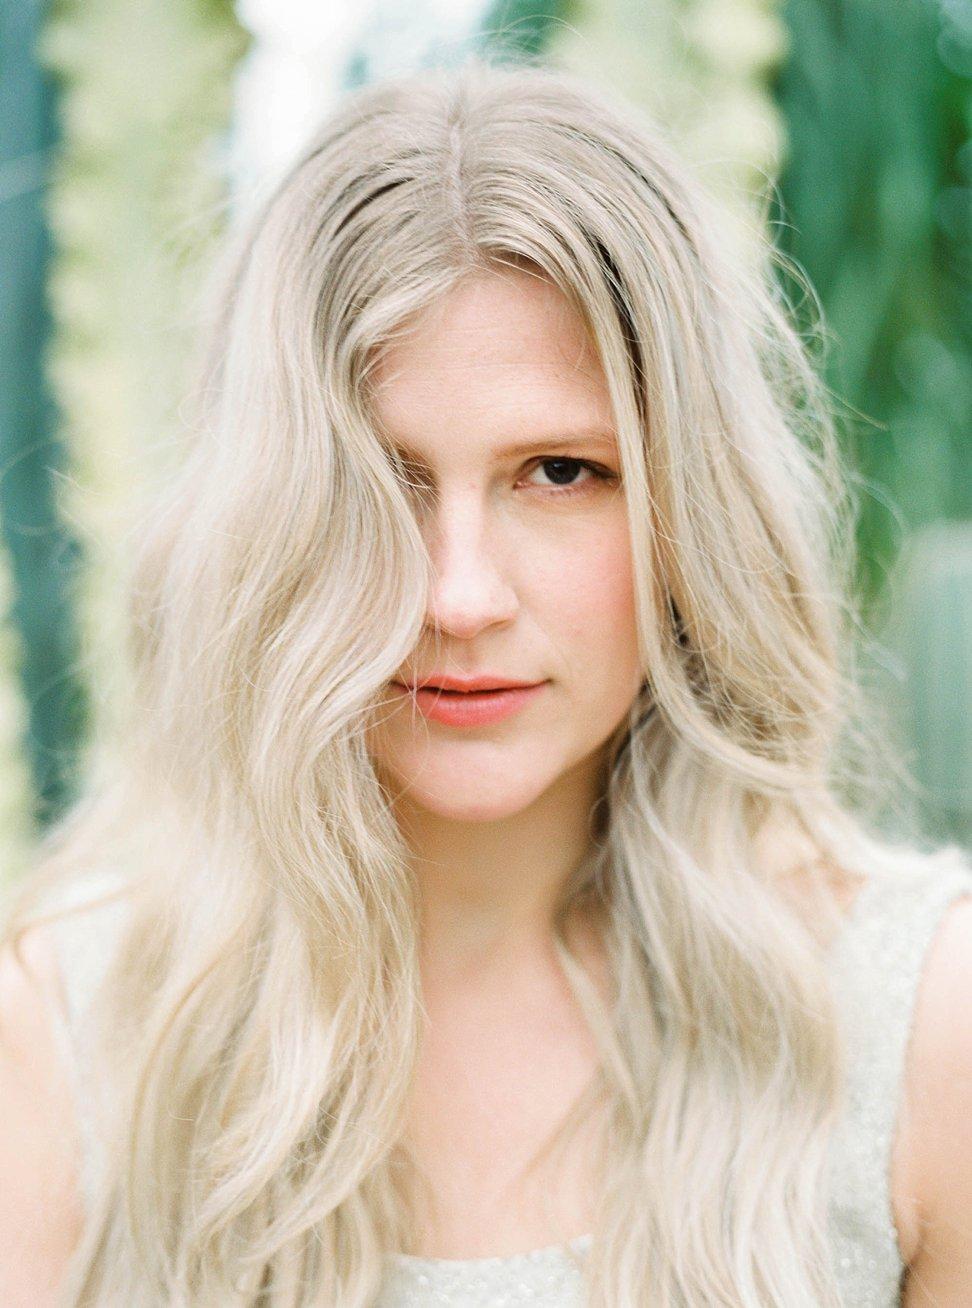 Amanda-Drost-Photography-Fine-Art_0004.jpg